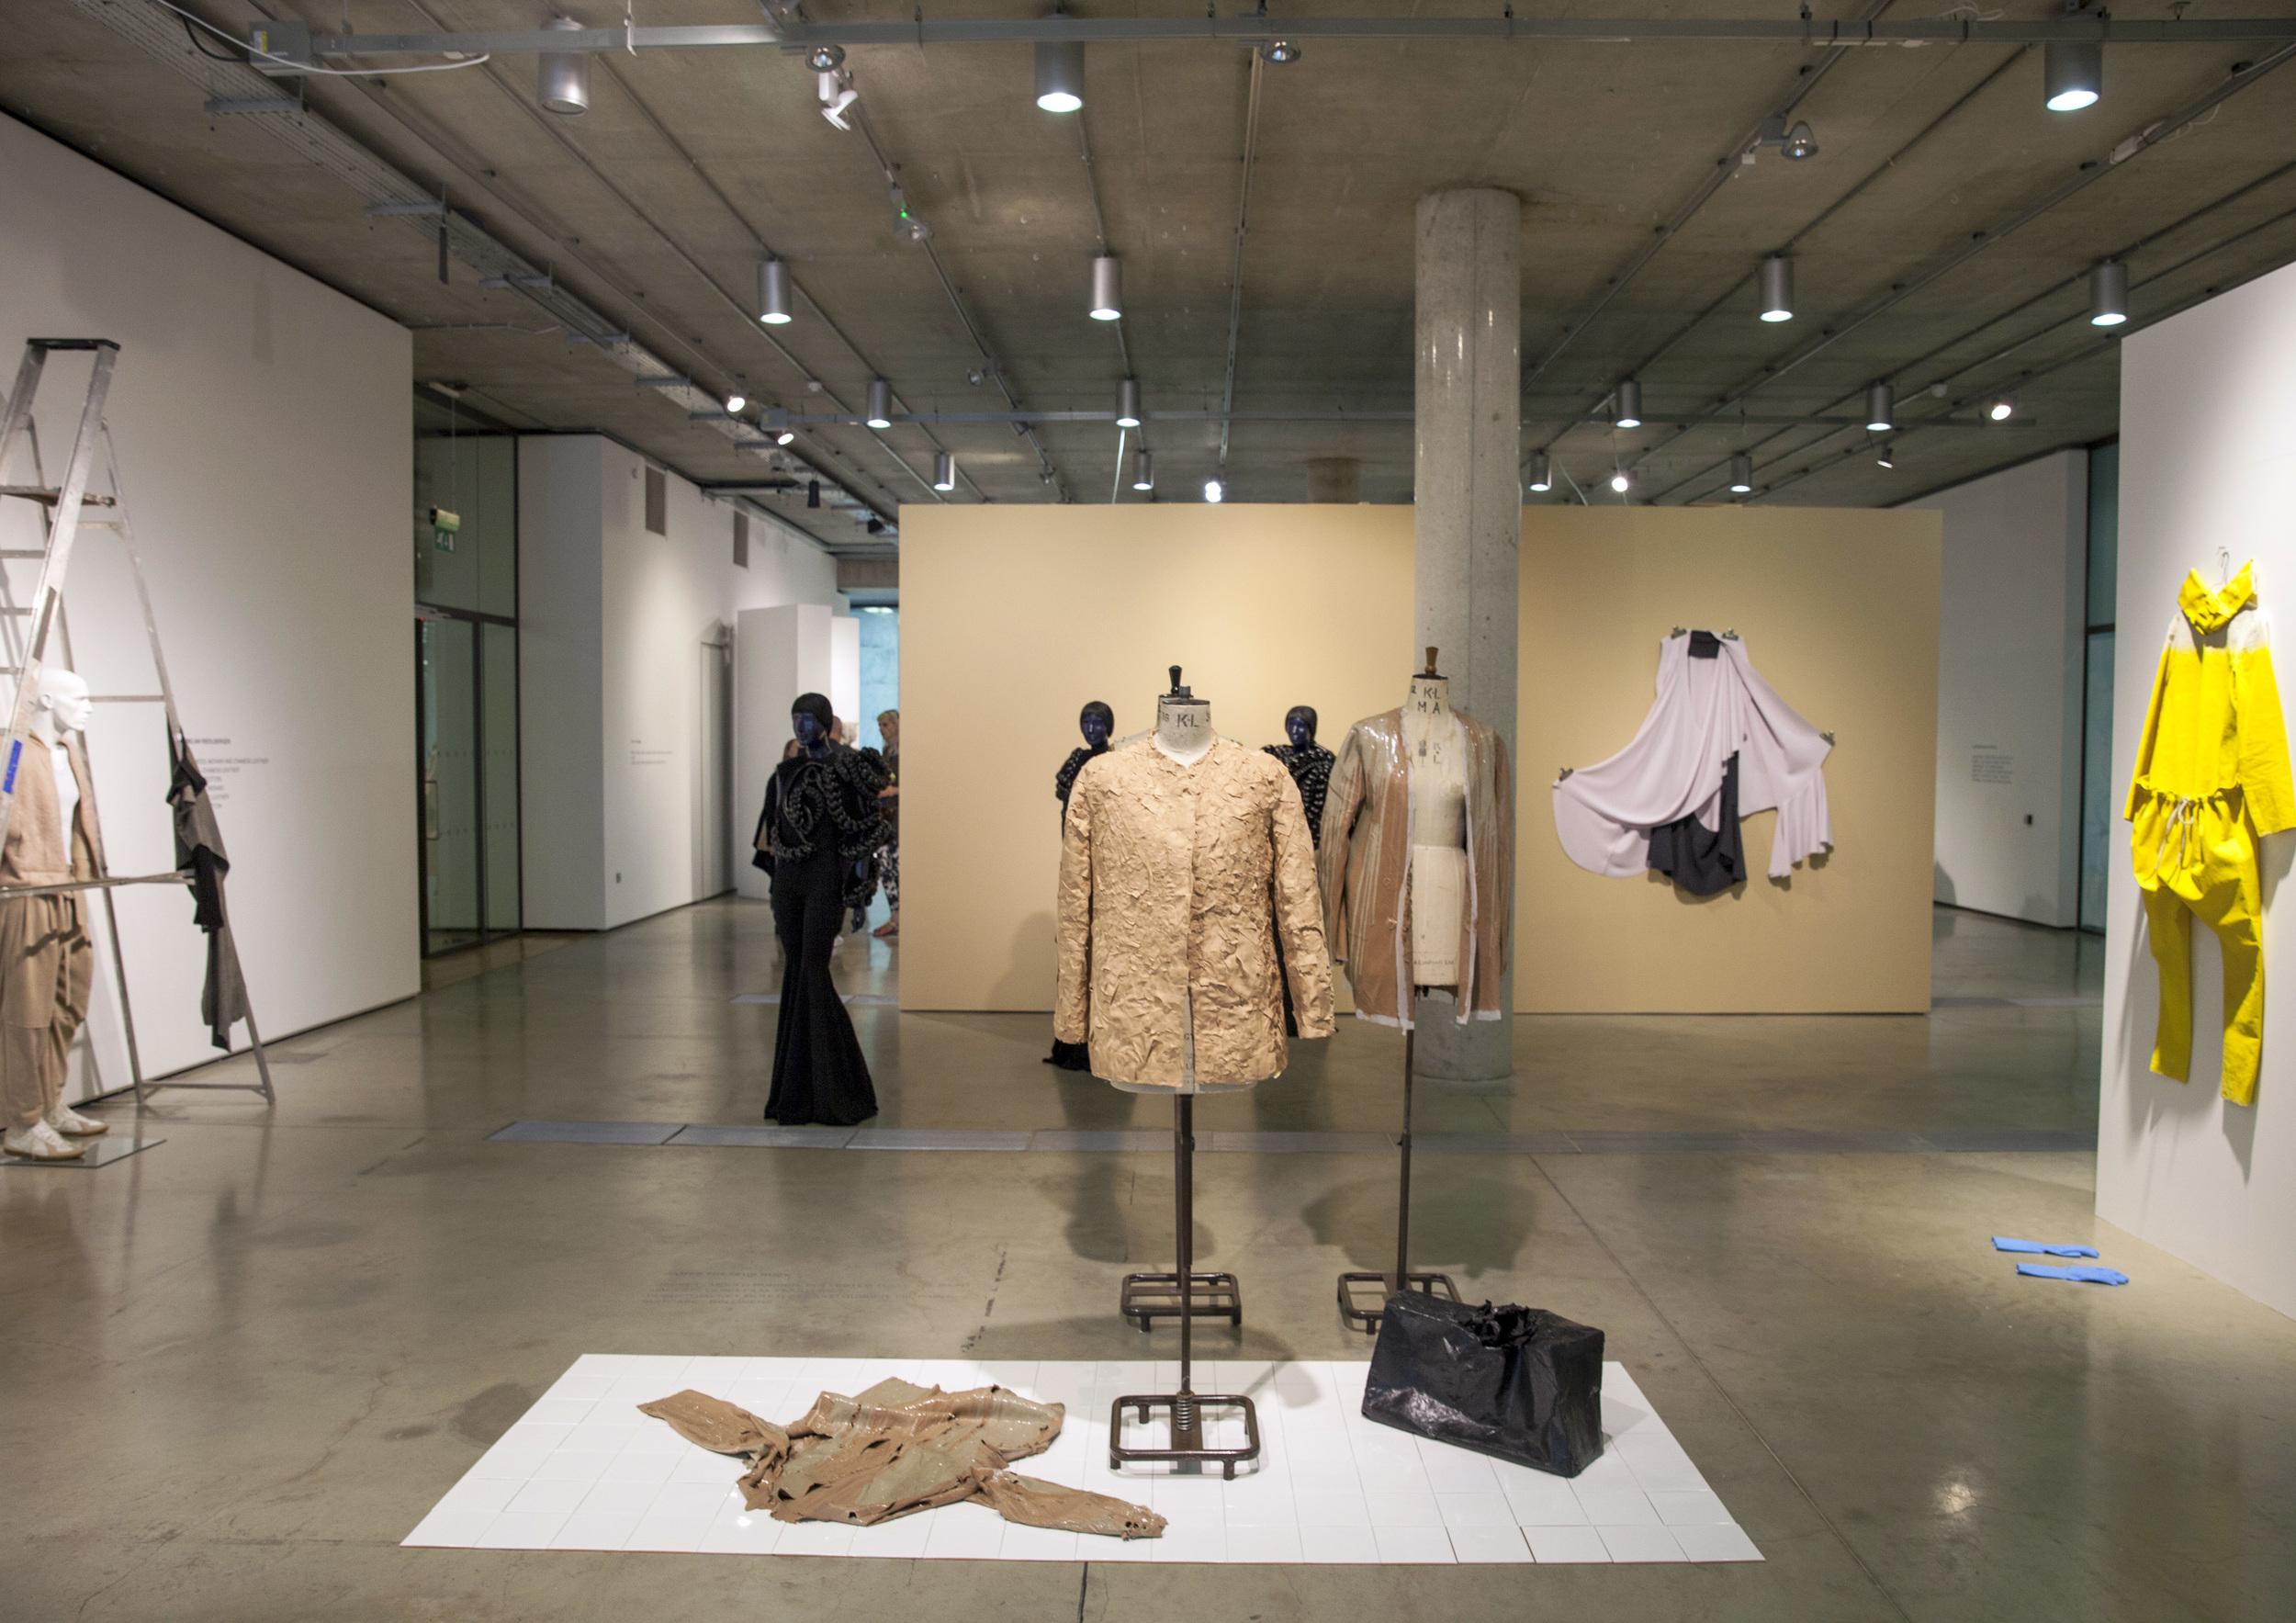 Nude Exhibition April 2015 ©Marco Kesseler